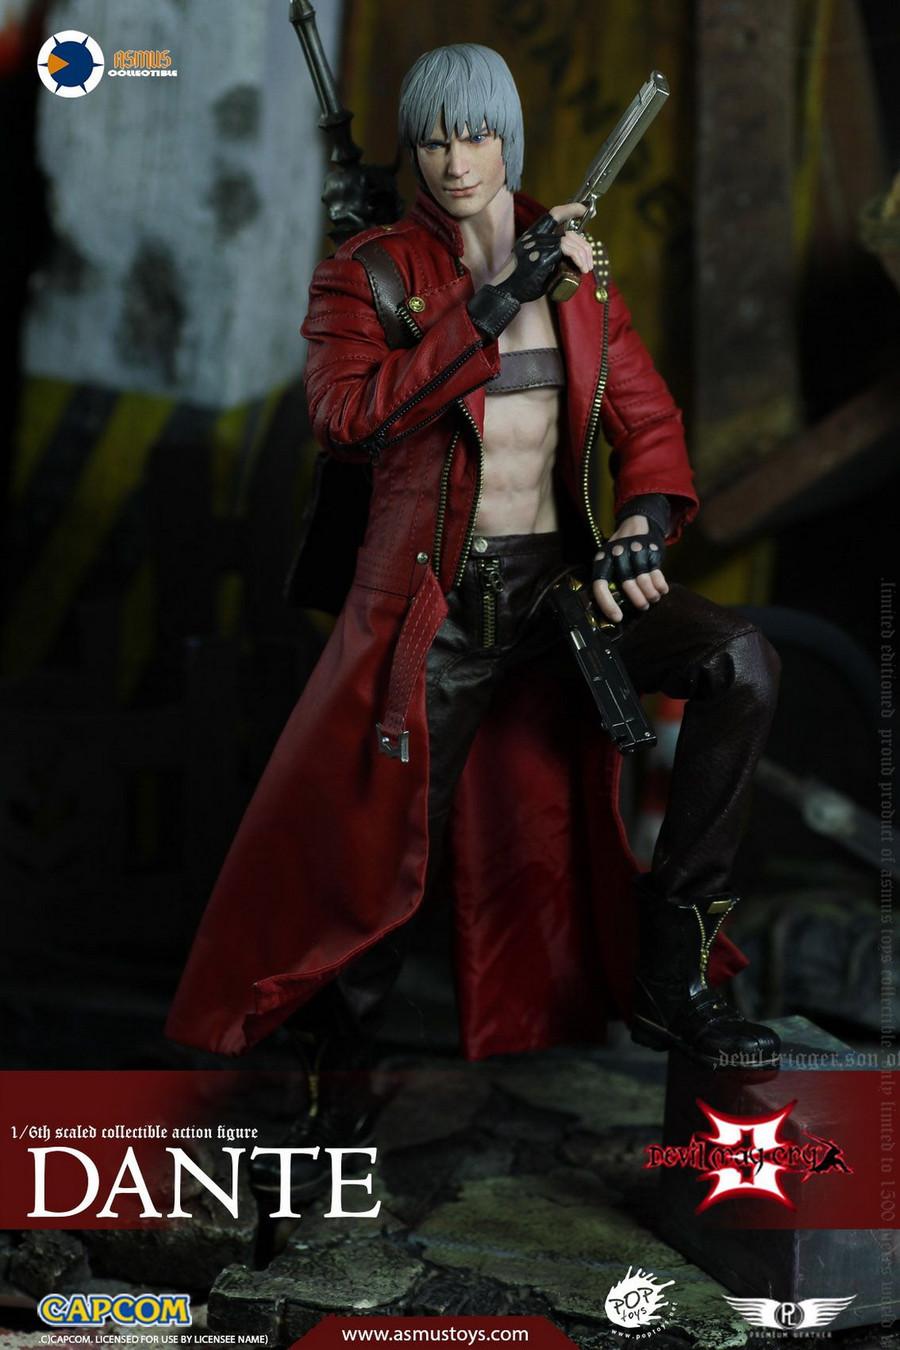 Asmus Toys - The Devil May Cry Series: Dante DMC III